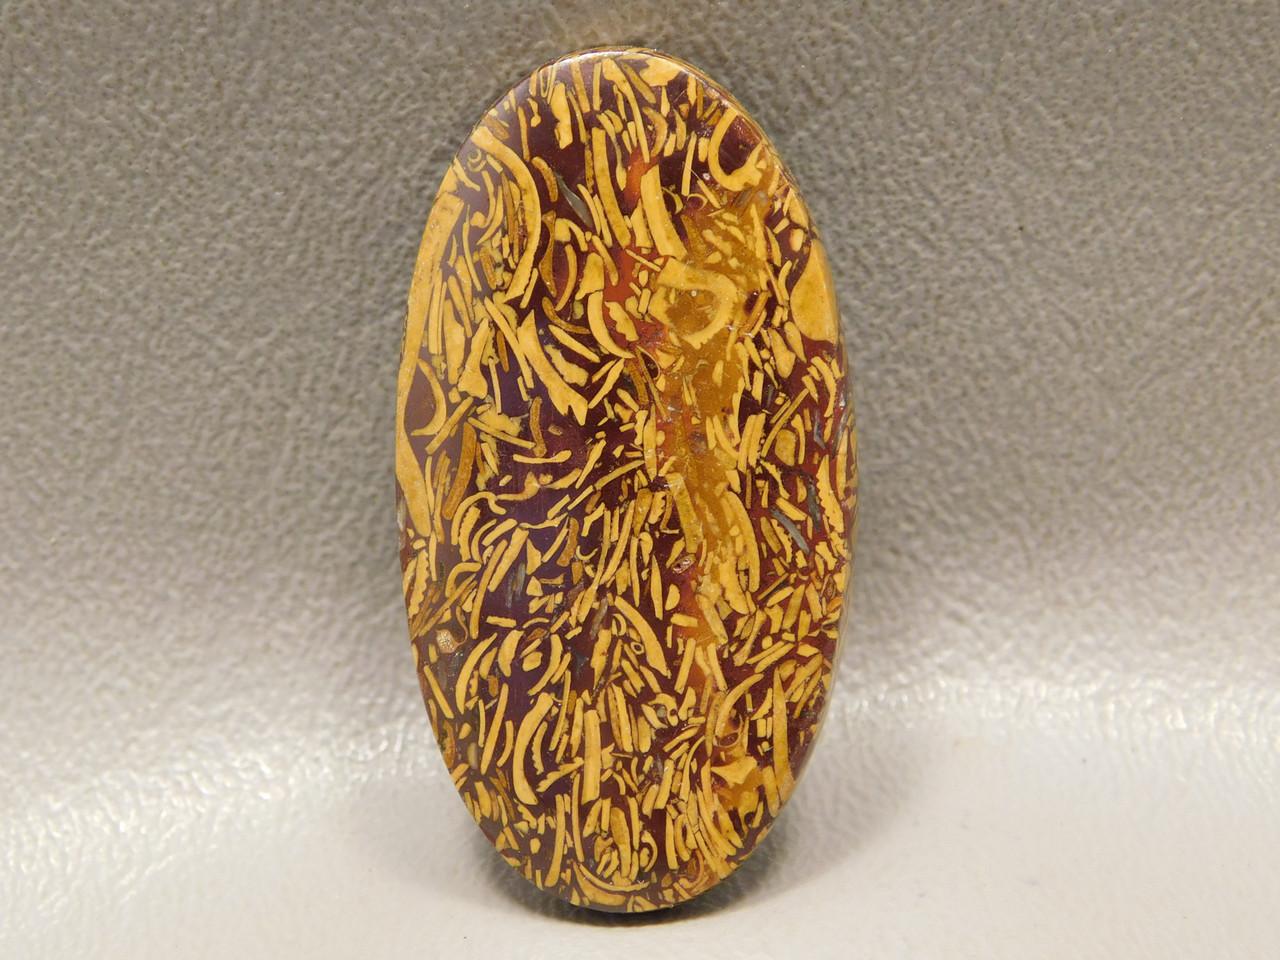 Cabochon Coquina Jasper Cobra Stone Calligraphy Script Stone #11